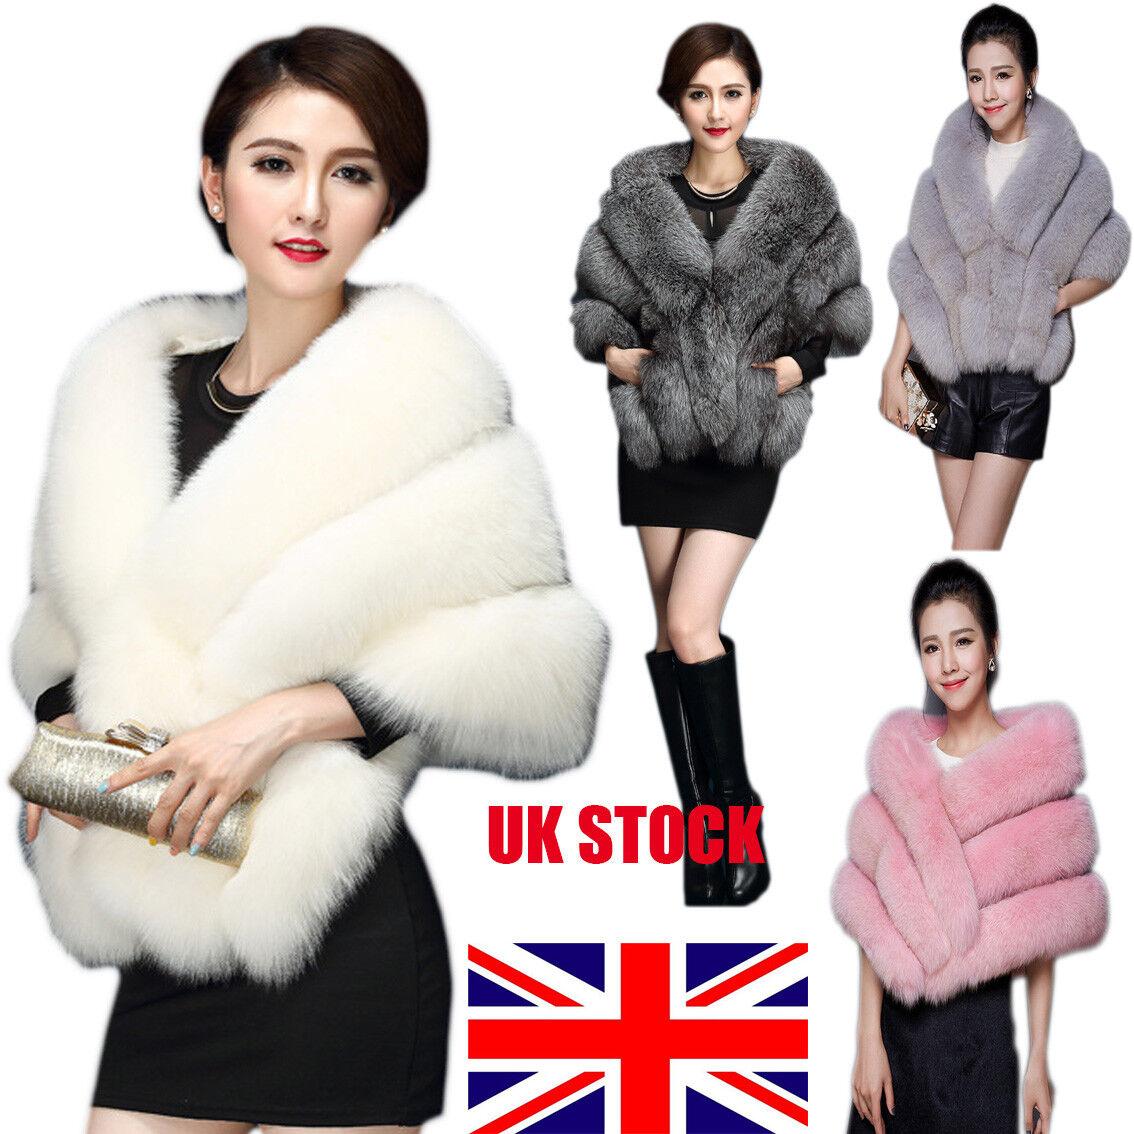 UK Bridal Faux Mink Fur Shawl Wrap Shrug Warm Coat Wedding/&Dress Stole Cocktail